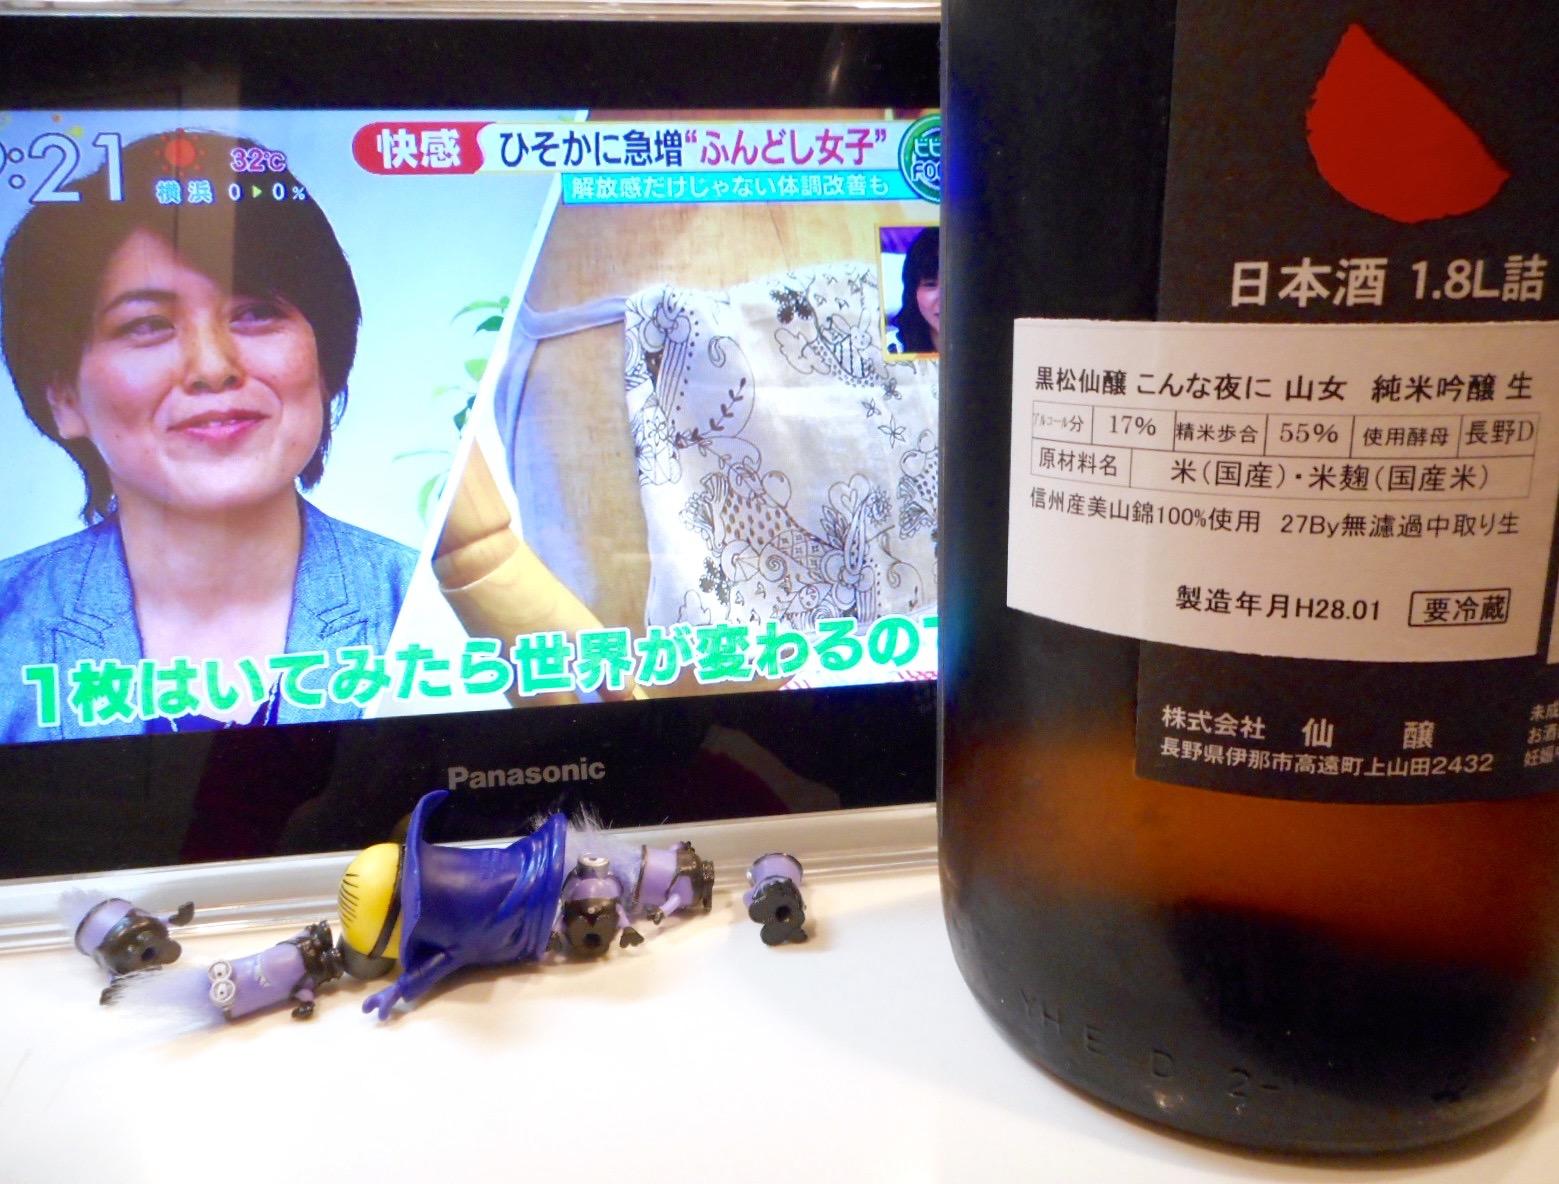 konnayoruni_yamame_nakadori27by2.jpg